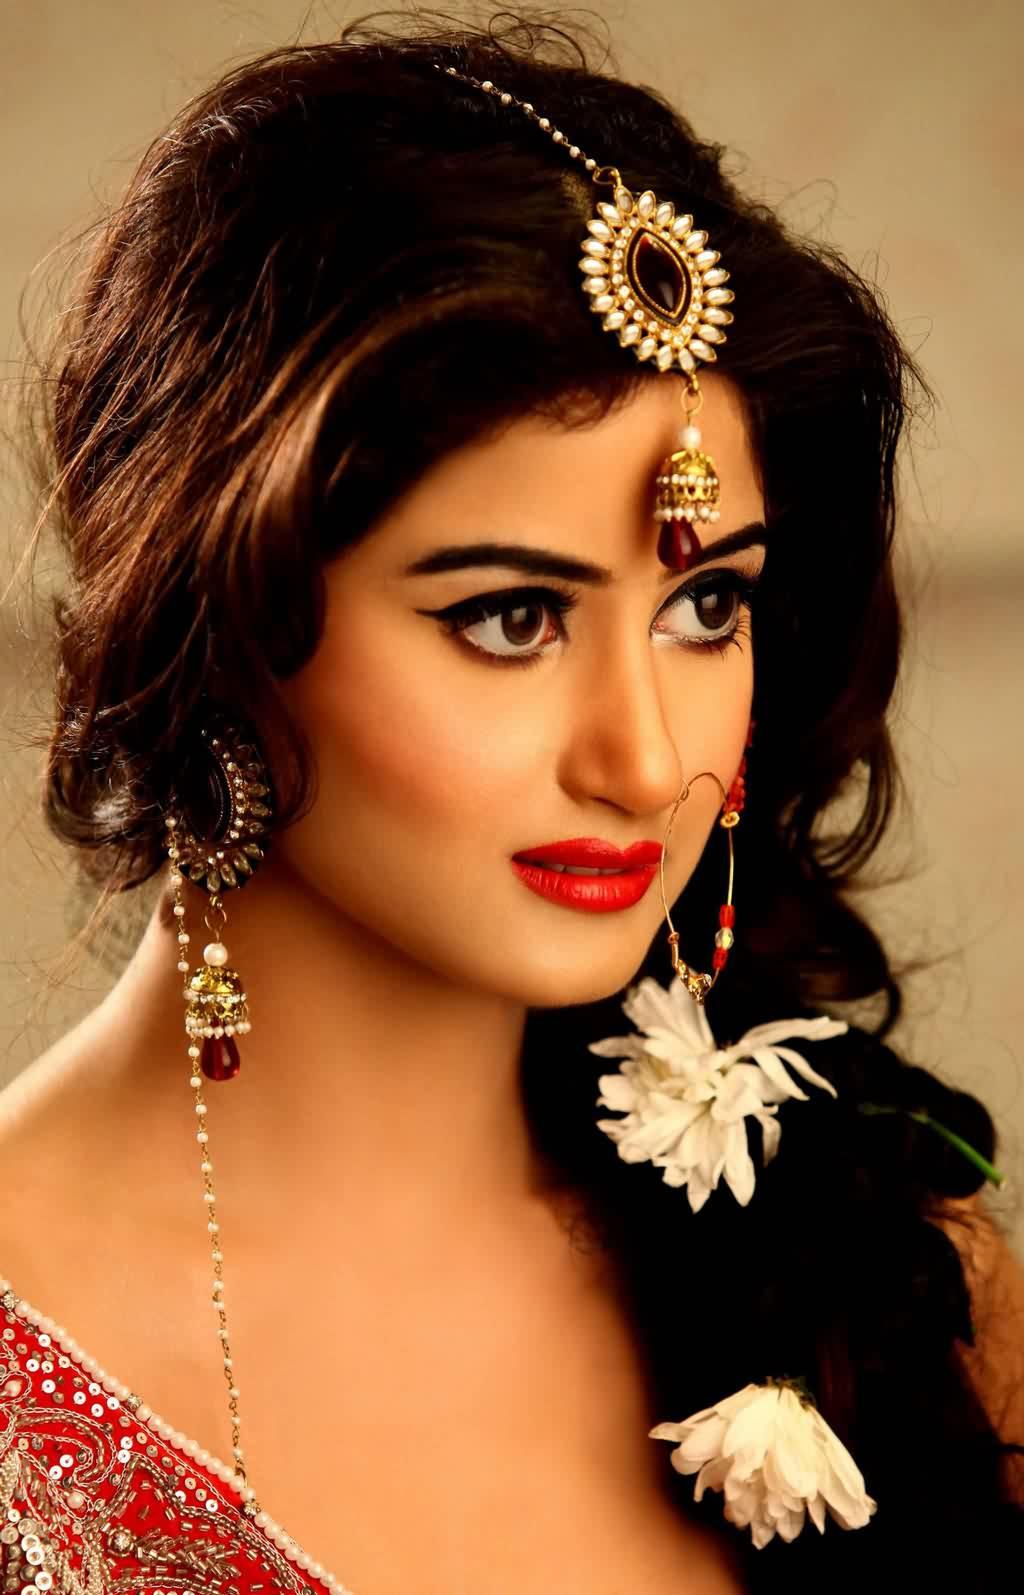 Bridal Makeup Photography : Bridal Jewellery Pictures of Sajal Ali Bridal Makeup ...